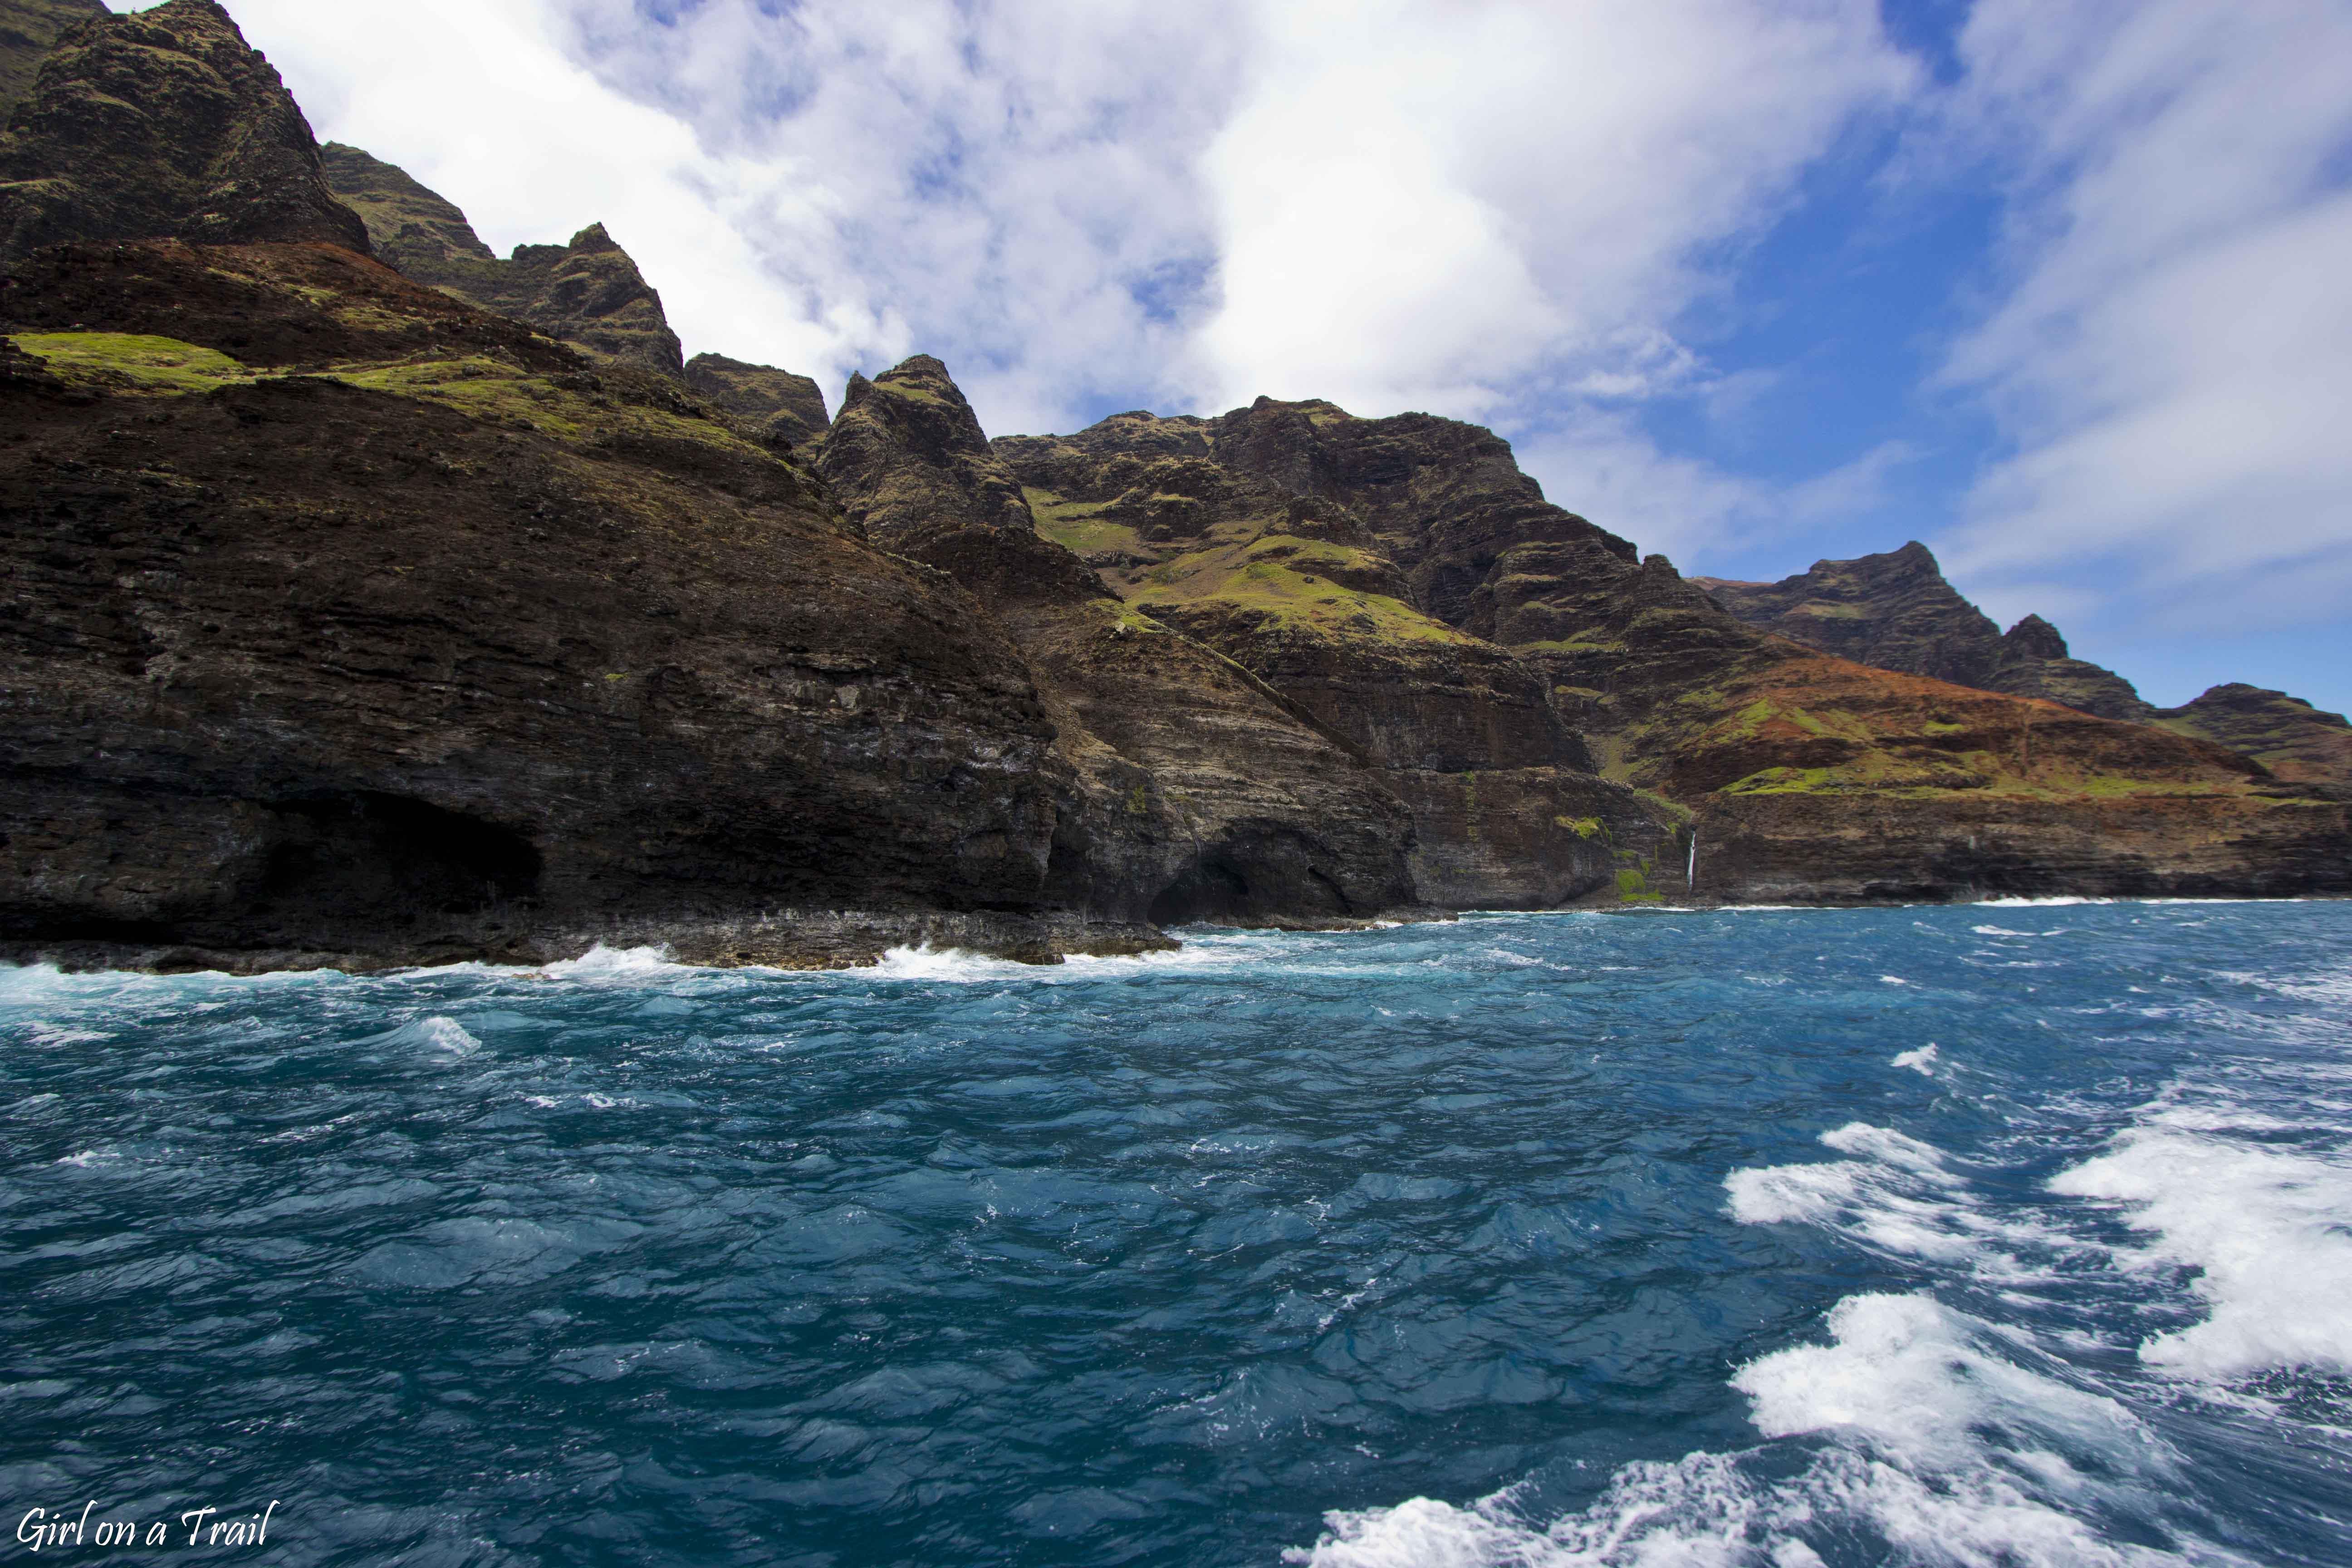 Hawaii - Kaua'i Island/ Na PaliIMG_2076